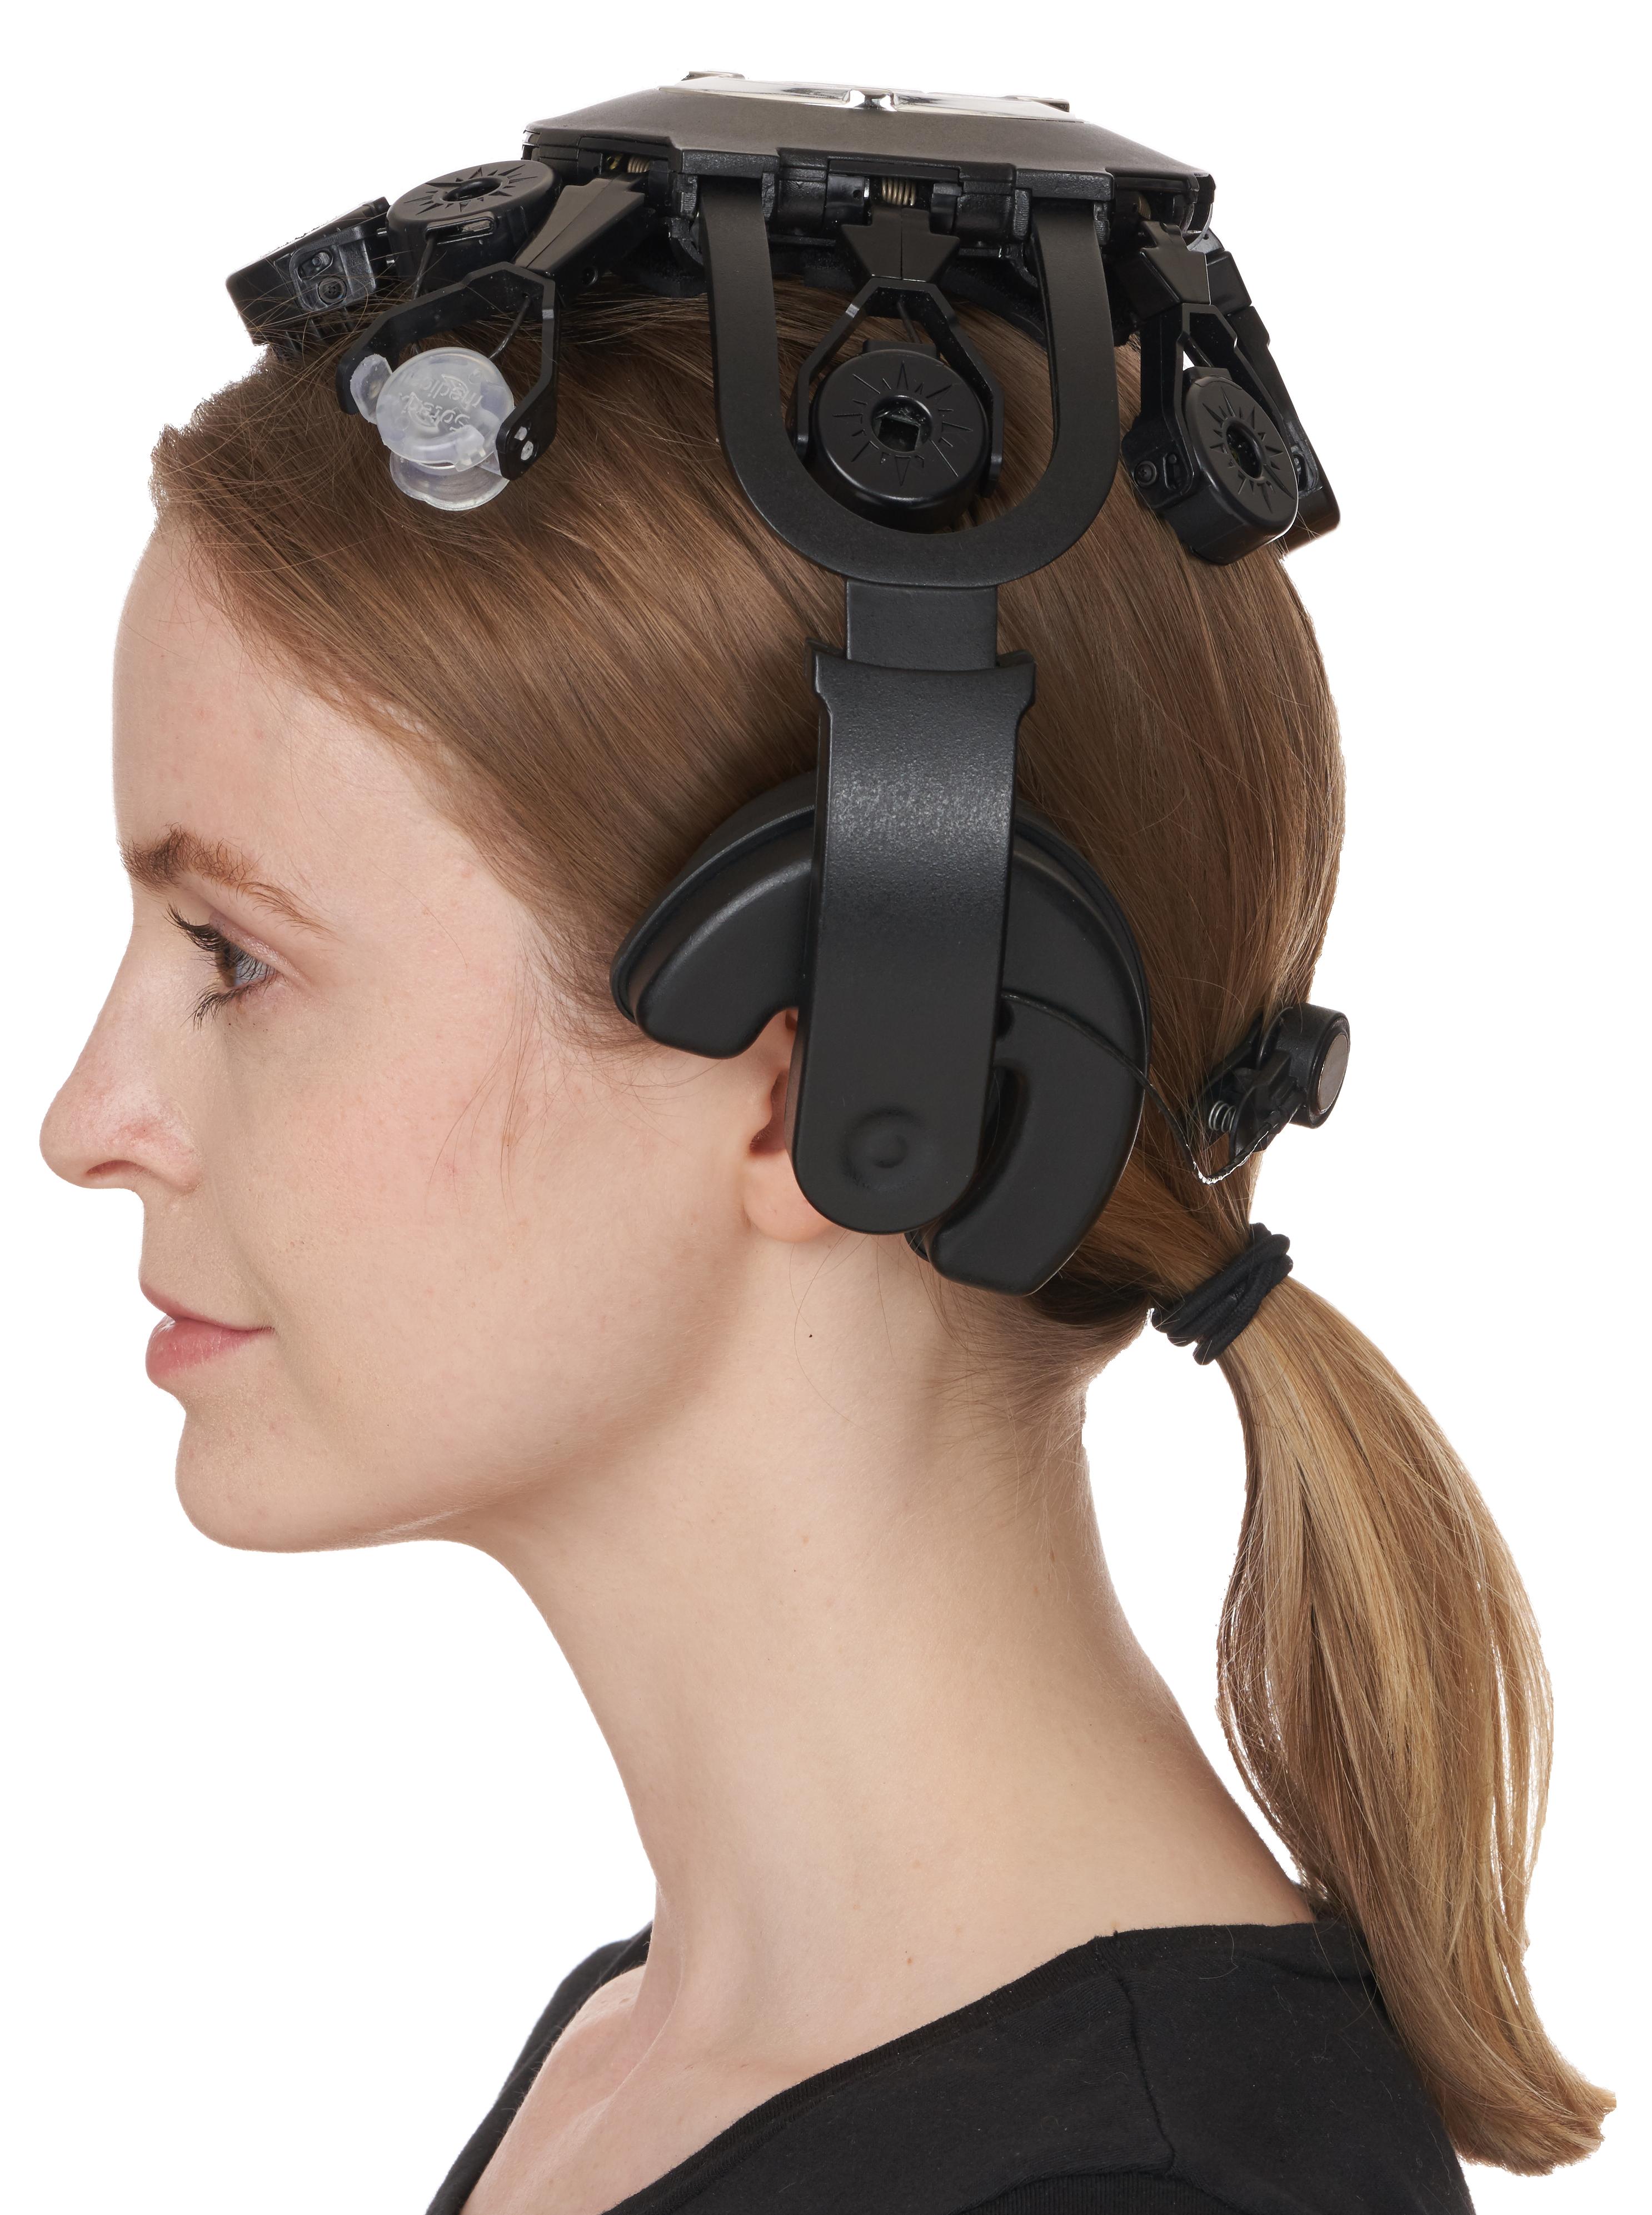 Soterix Medical Wearable sensing